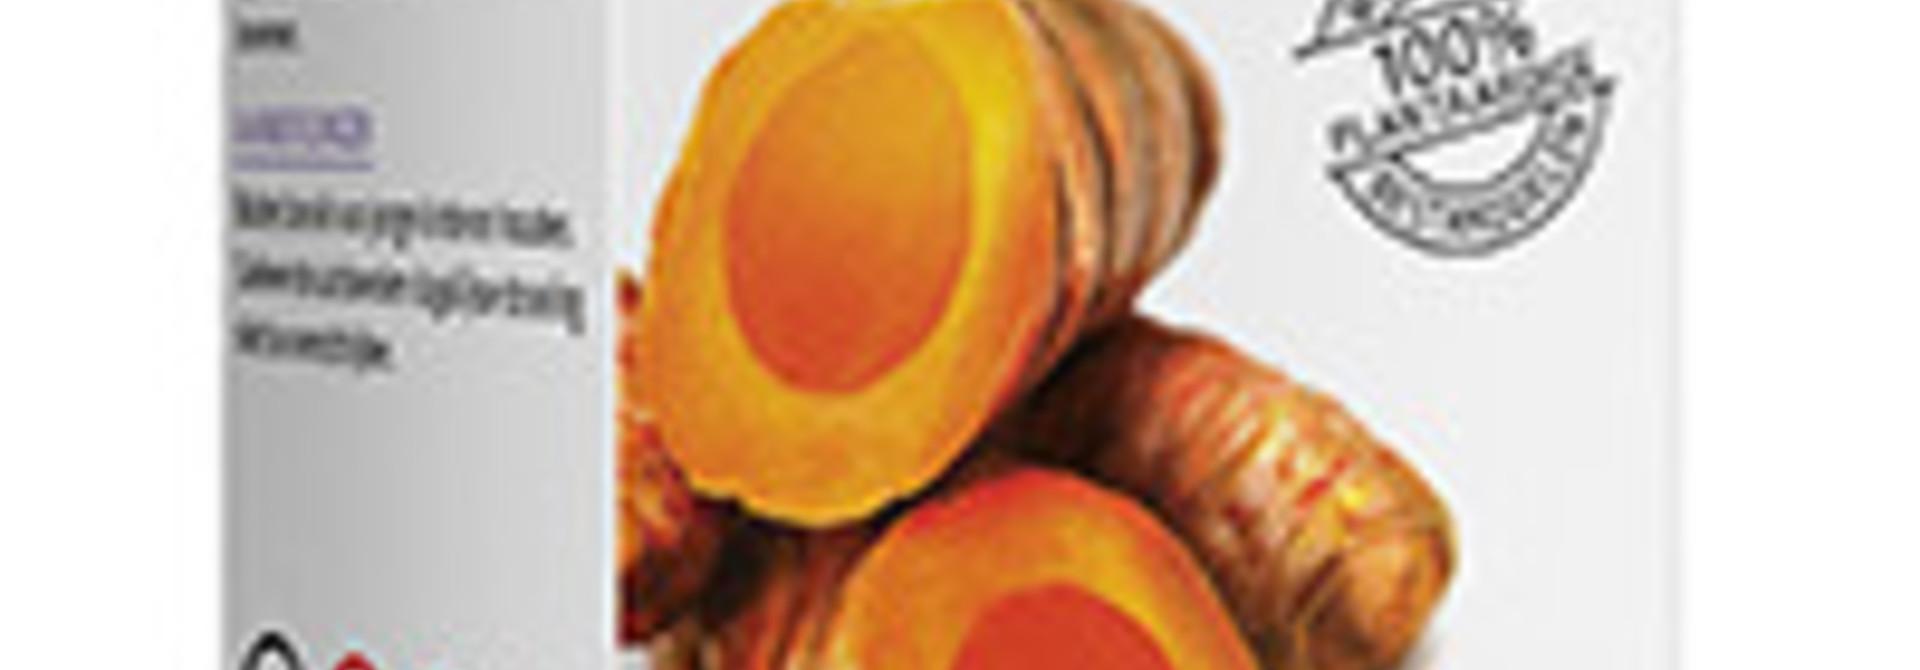 Curcuma + piperine 45 capsules